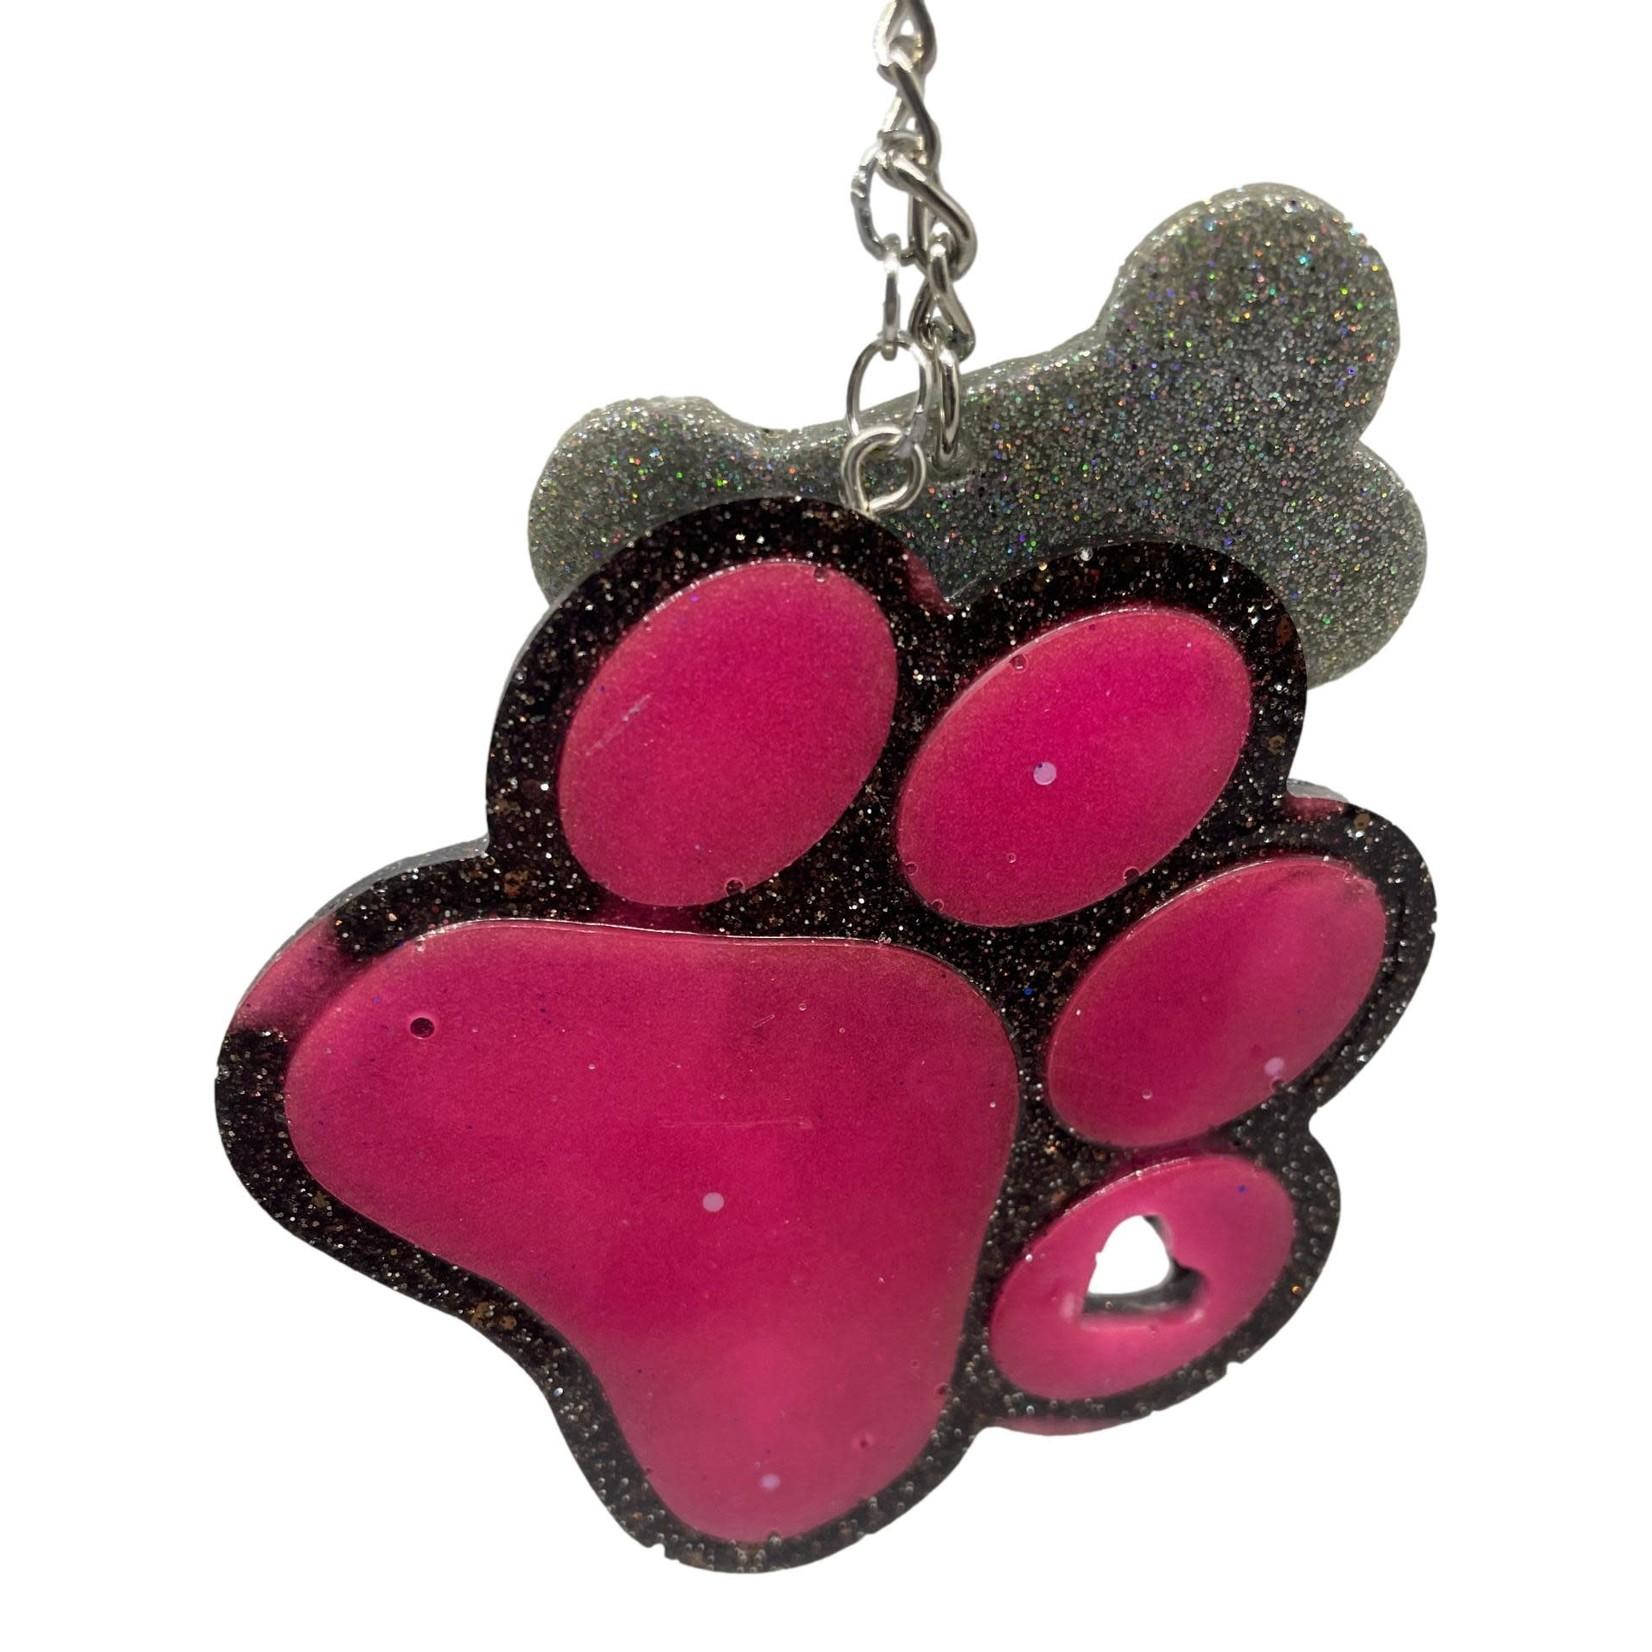 East Coast Sirens Brown & Pink Paw Print Key Chain Charm